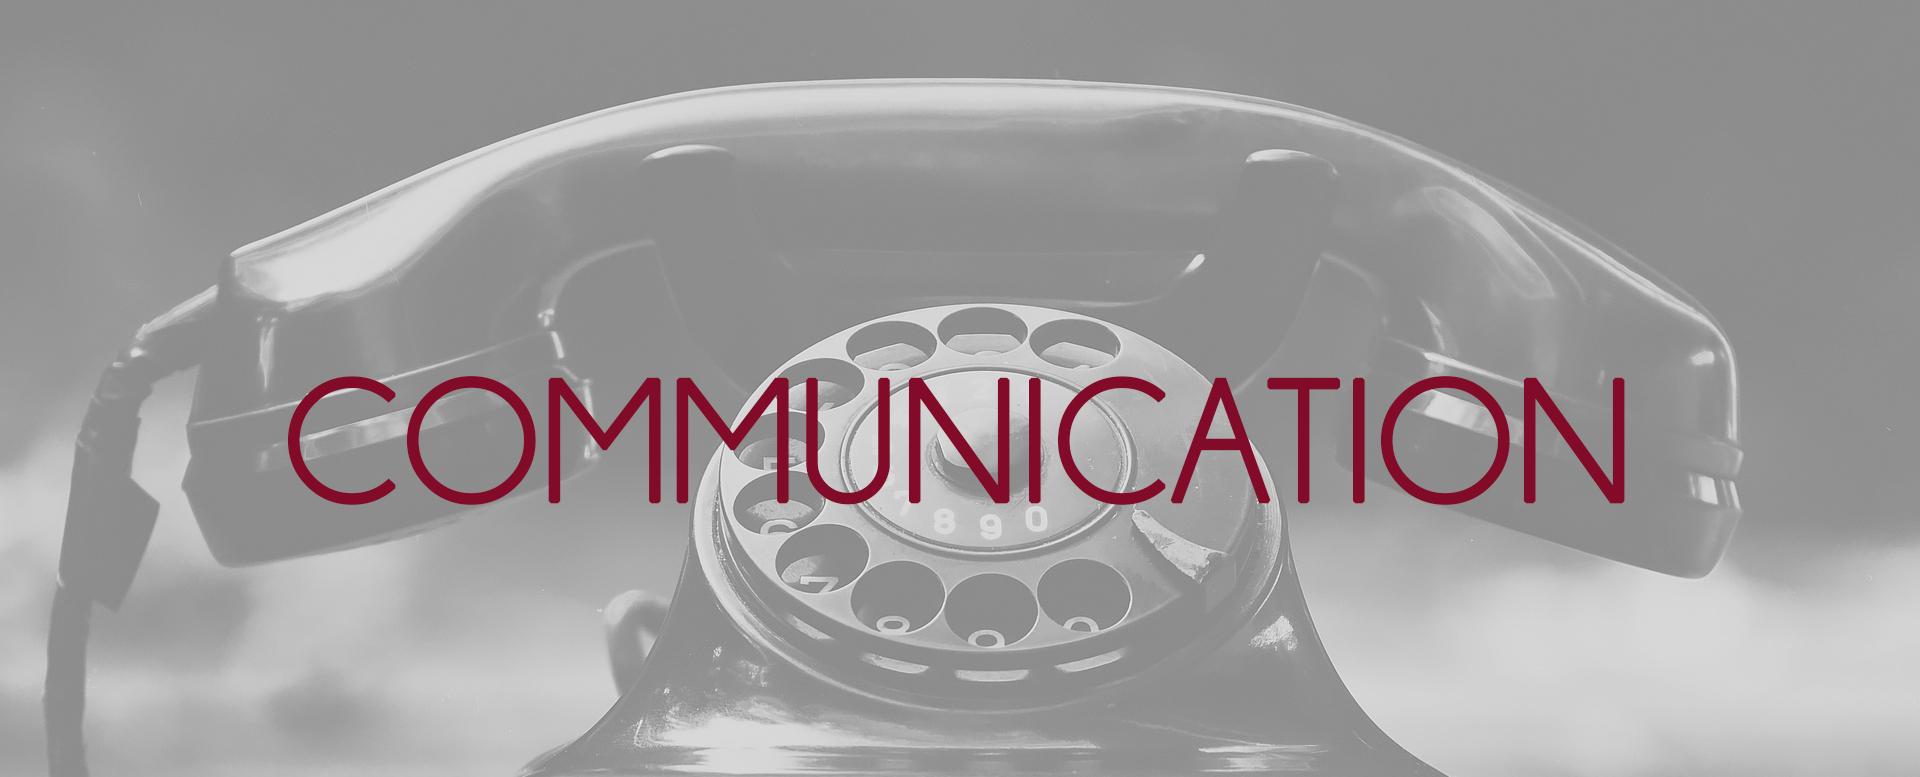 communication inhao freelance